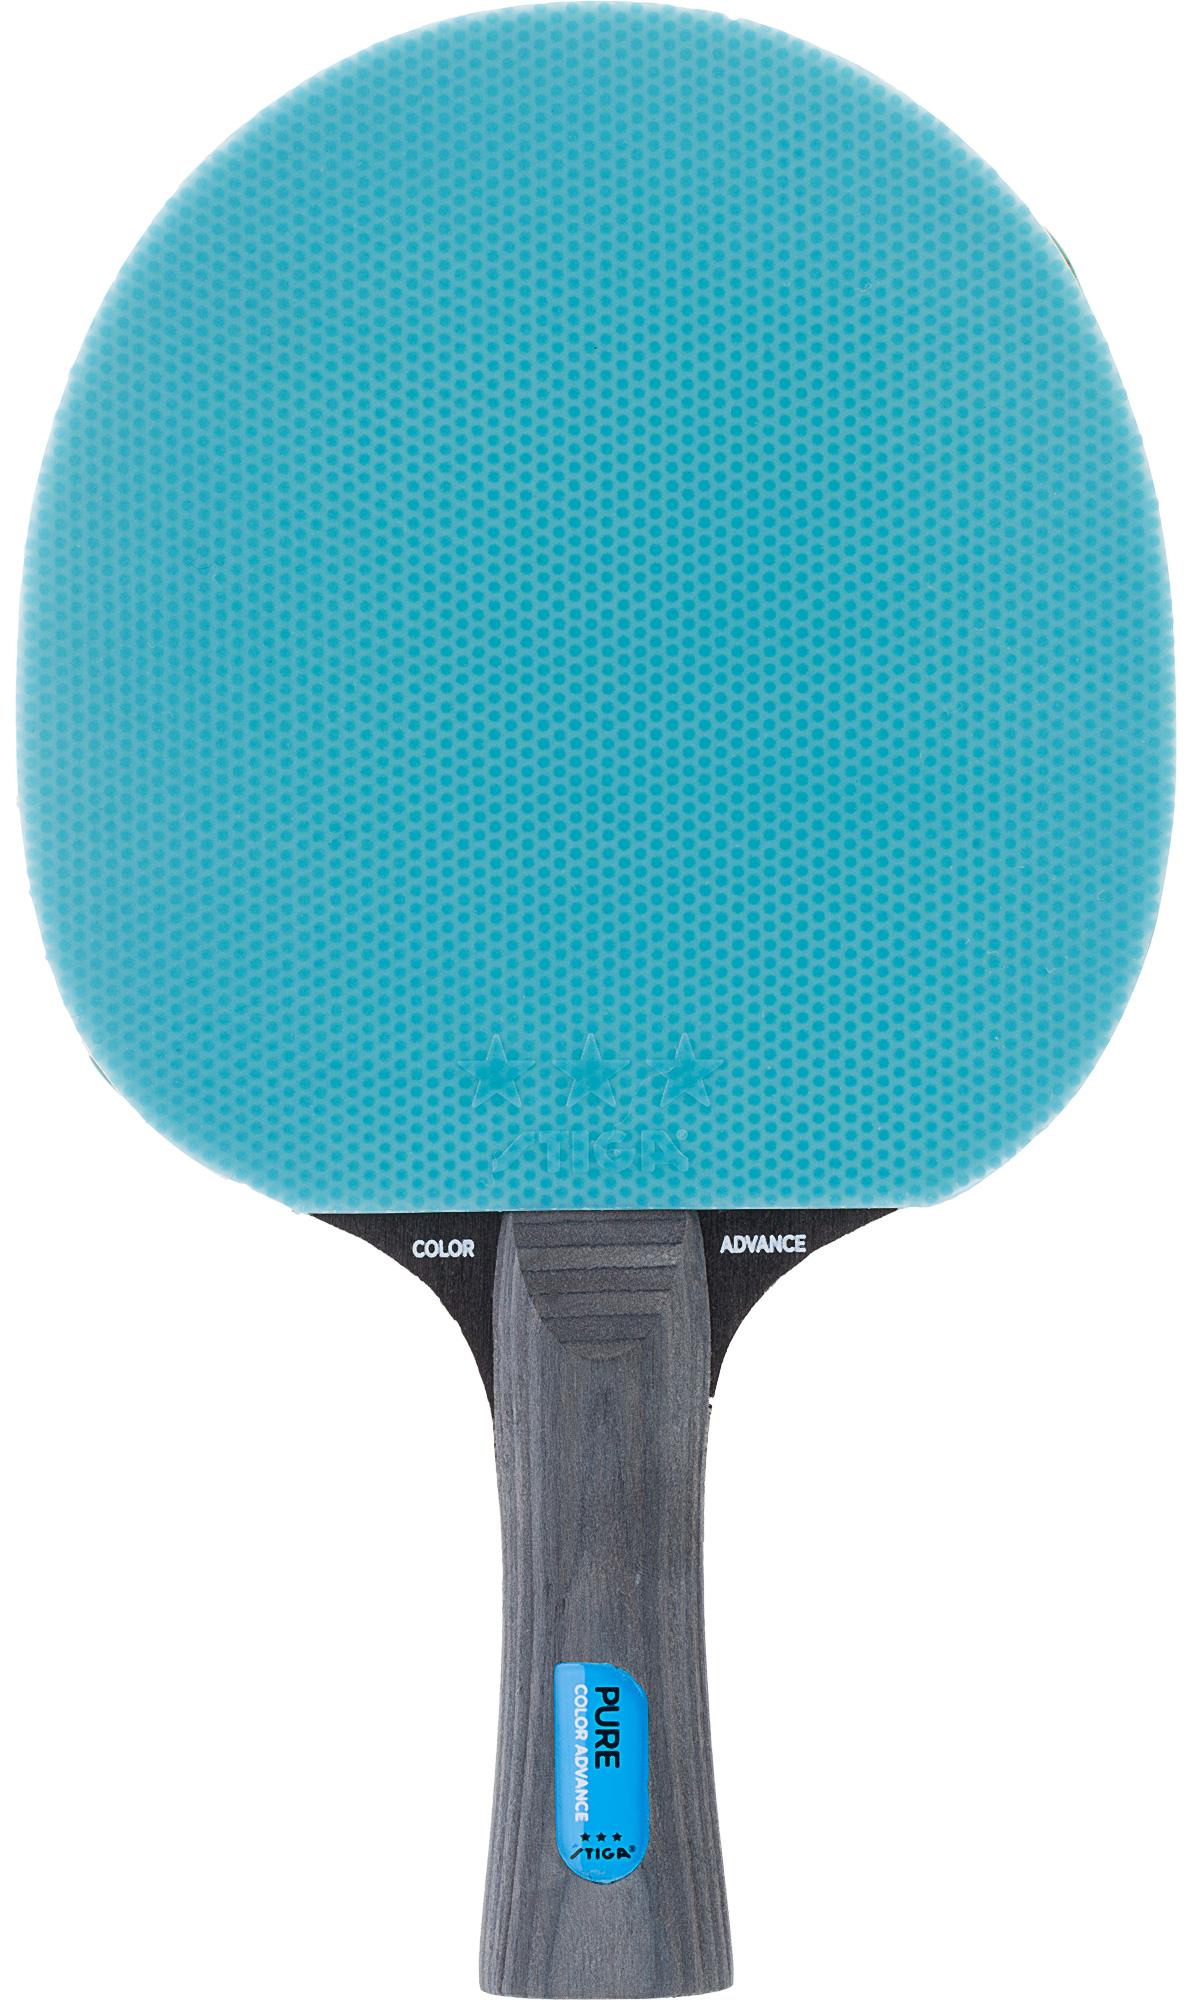 Stiga Ракетка для настольного тенниса Stiga Pure Cyan stiga st 3255 p